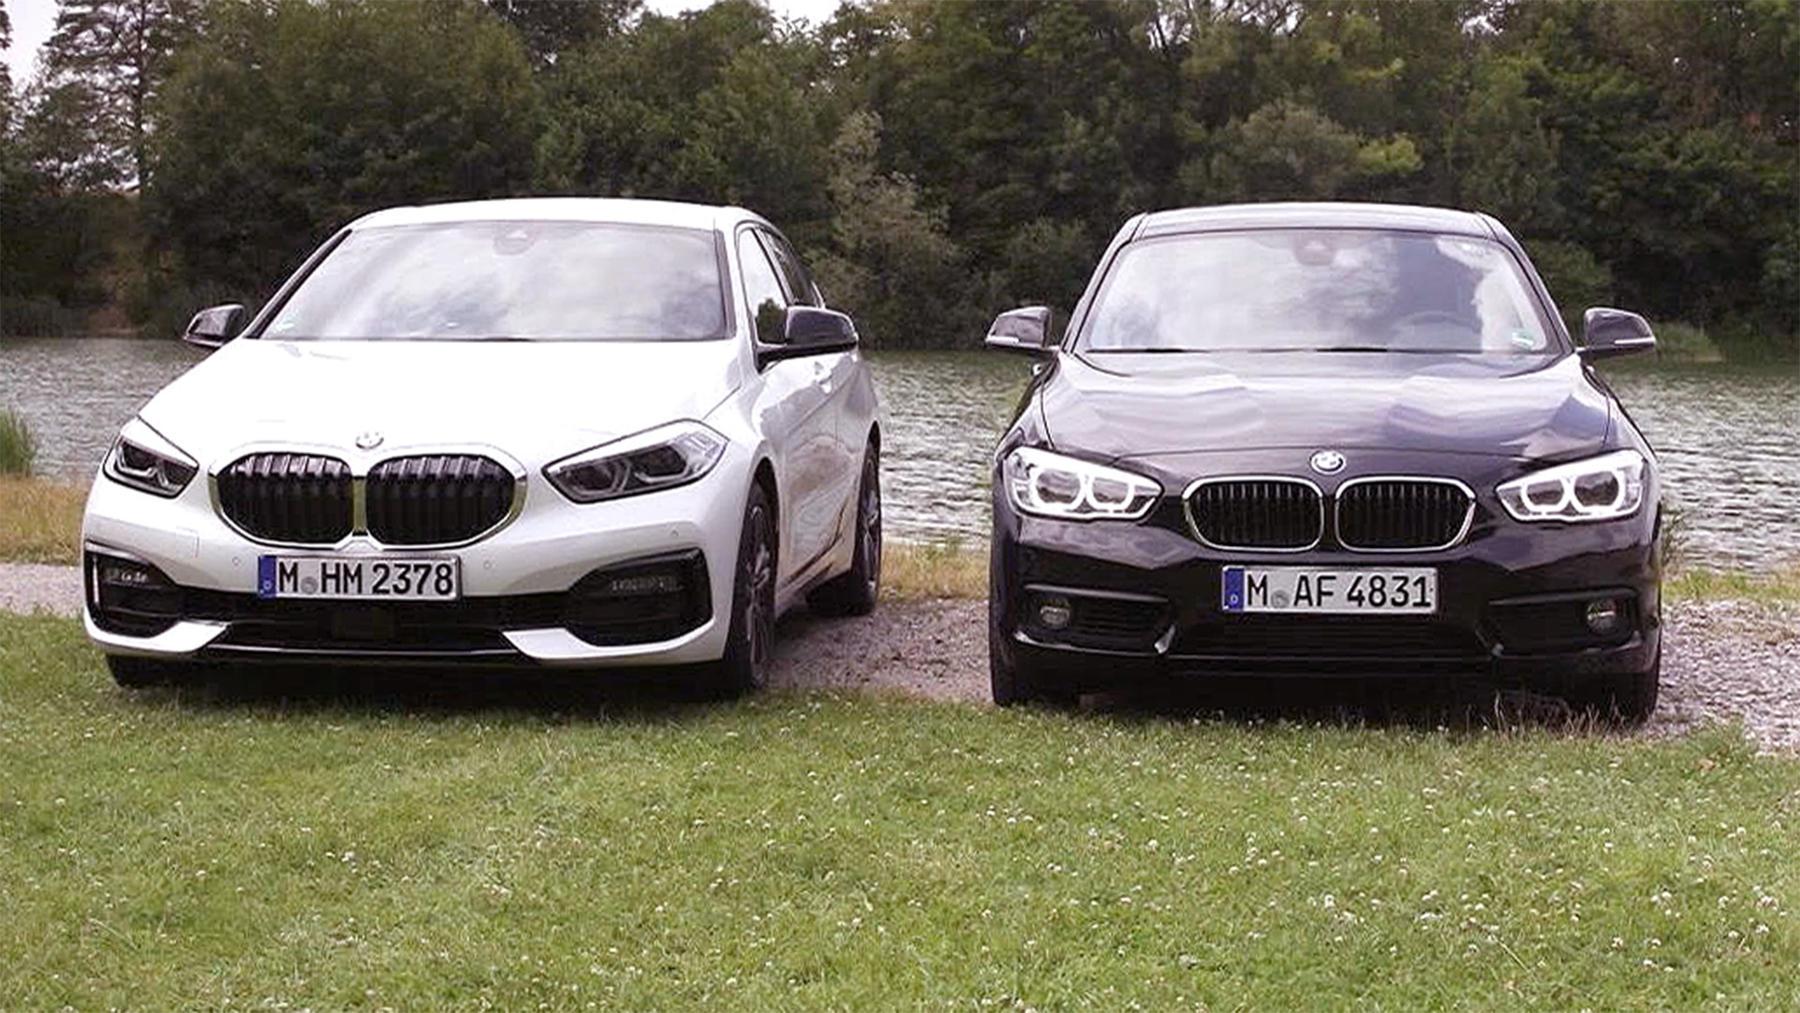 Thema u.a.: Fahrbericht BMW 1er mit Alex | Folge 29